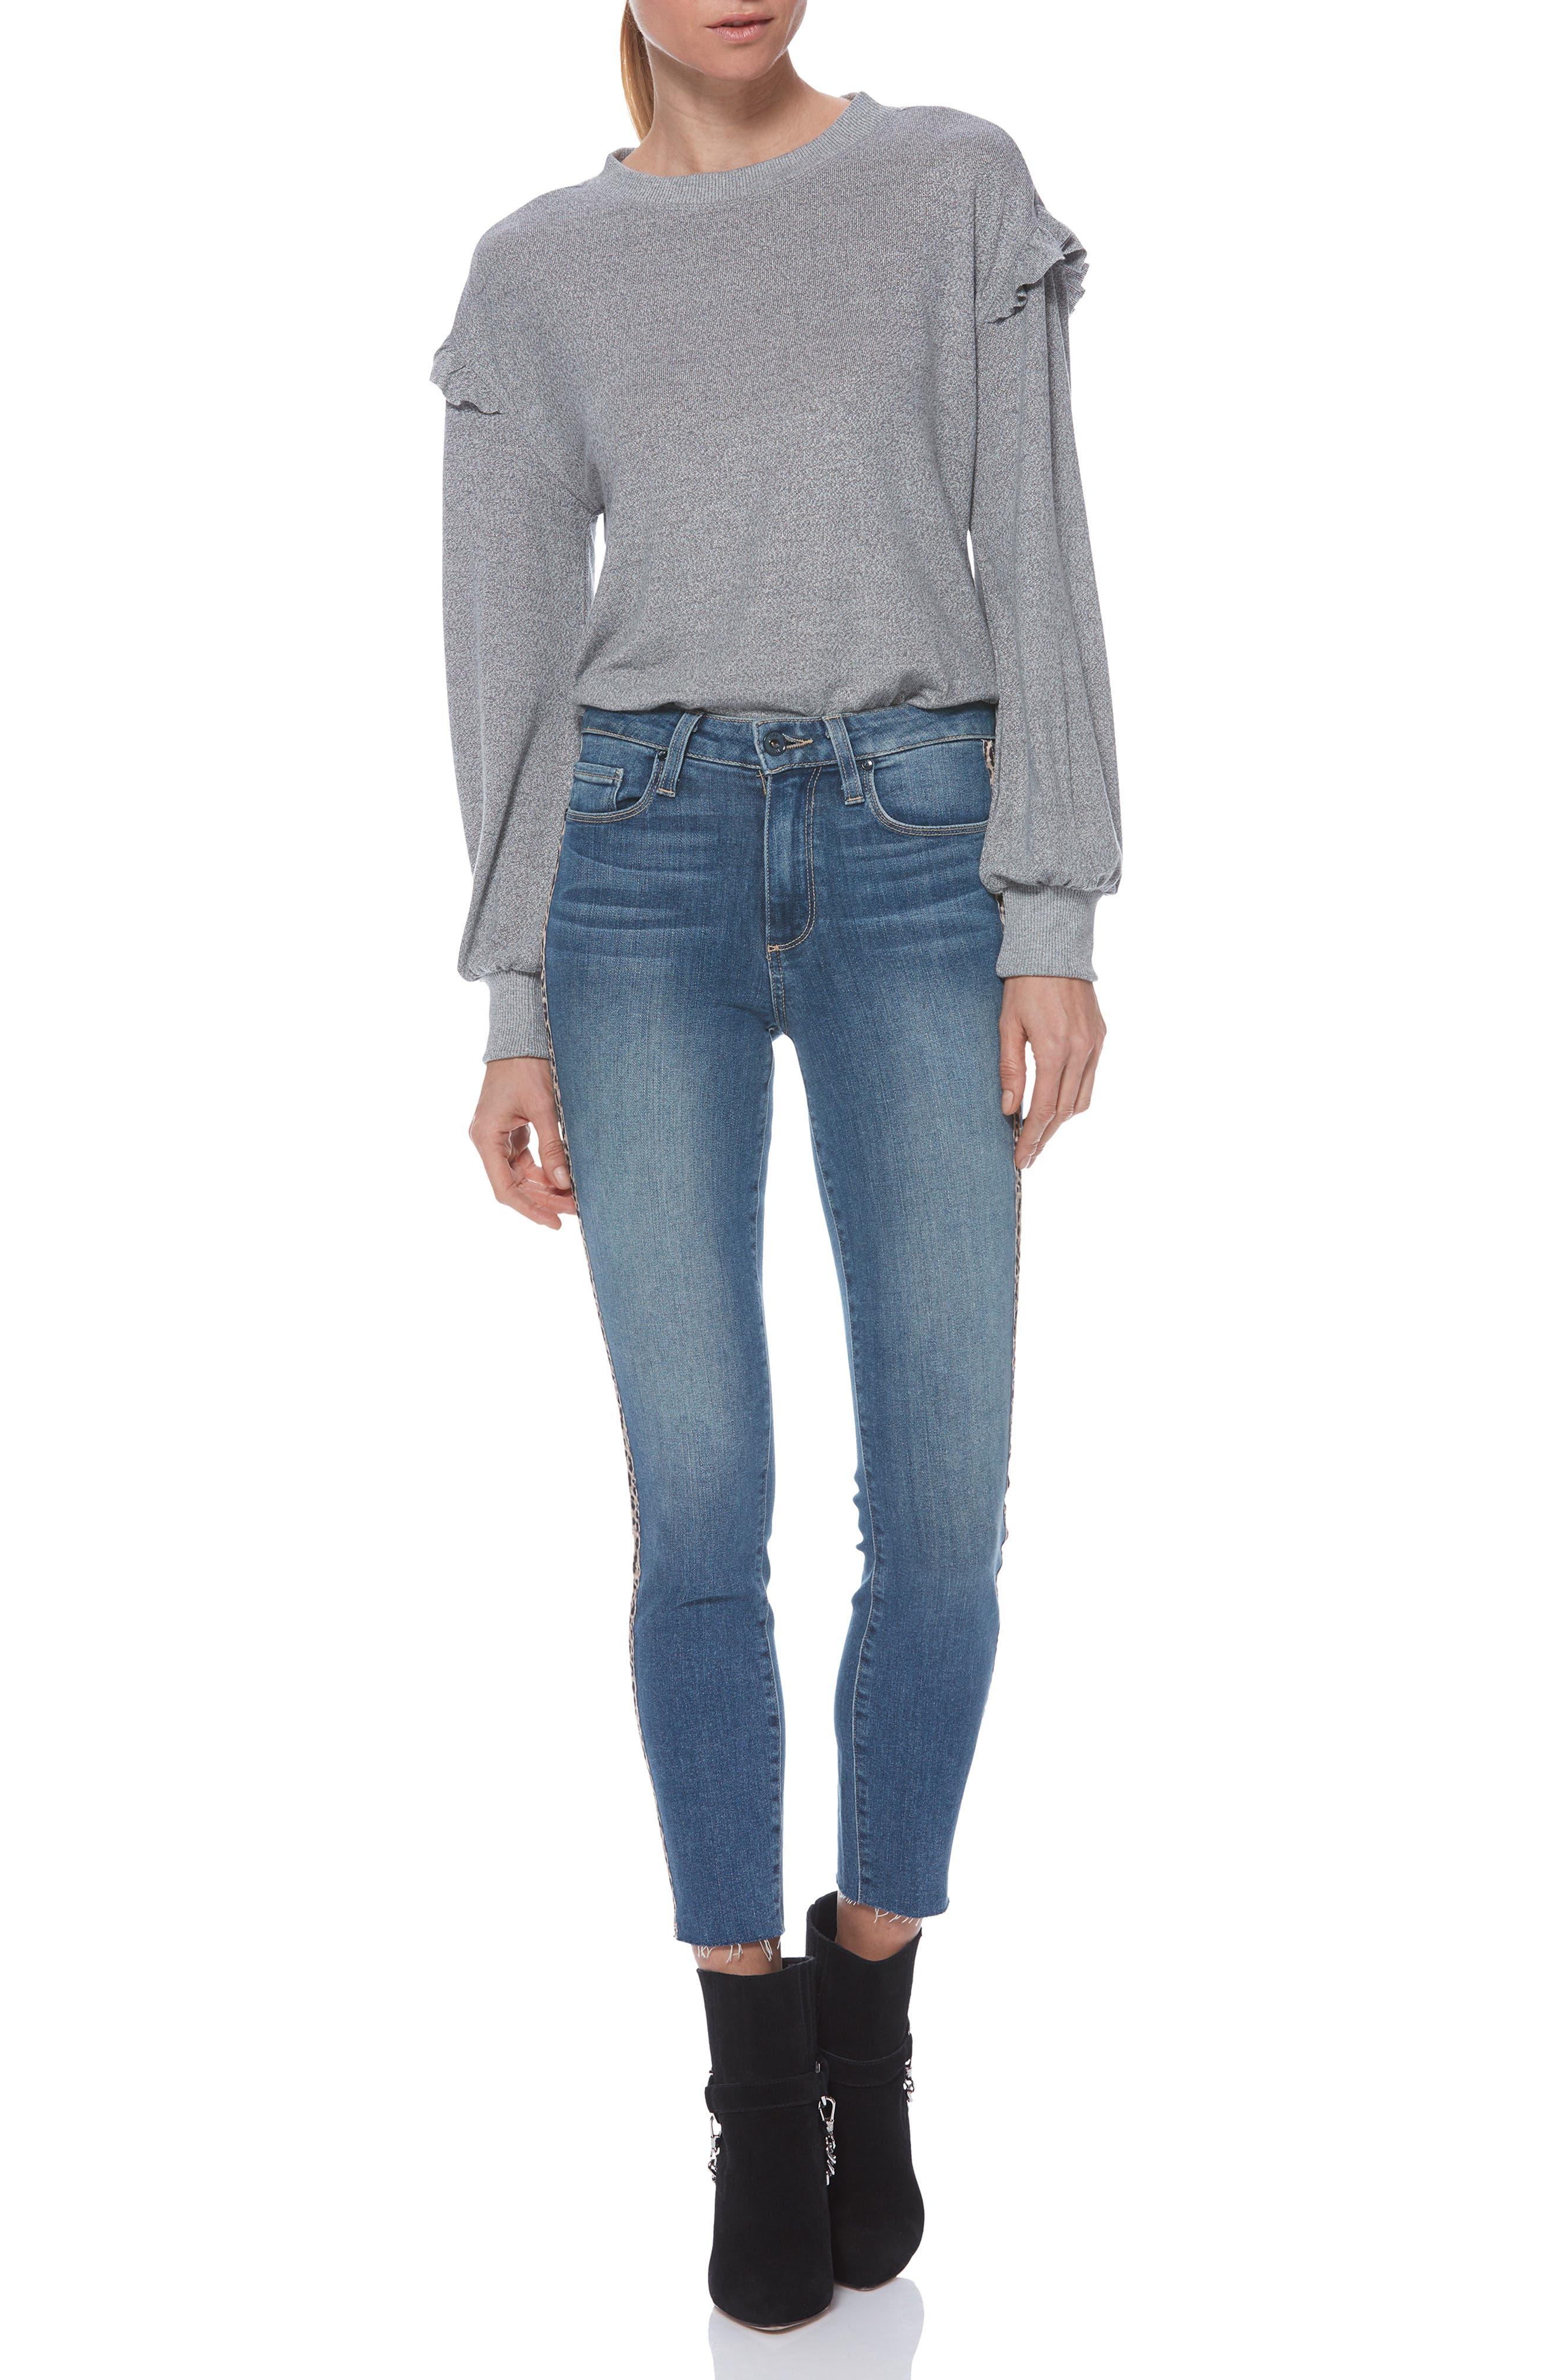 PAIGE, Hoxton High Waist Raw Hem Crop Skinny Jeans, Alternate thumbnail 7, color, BARKLEY W/ LEOPARD